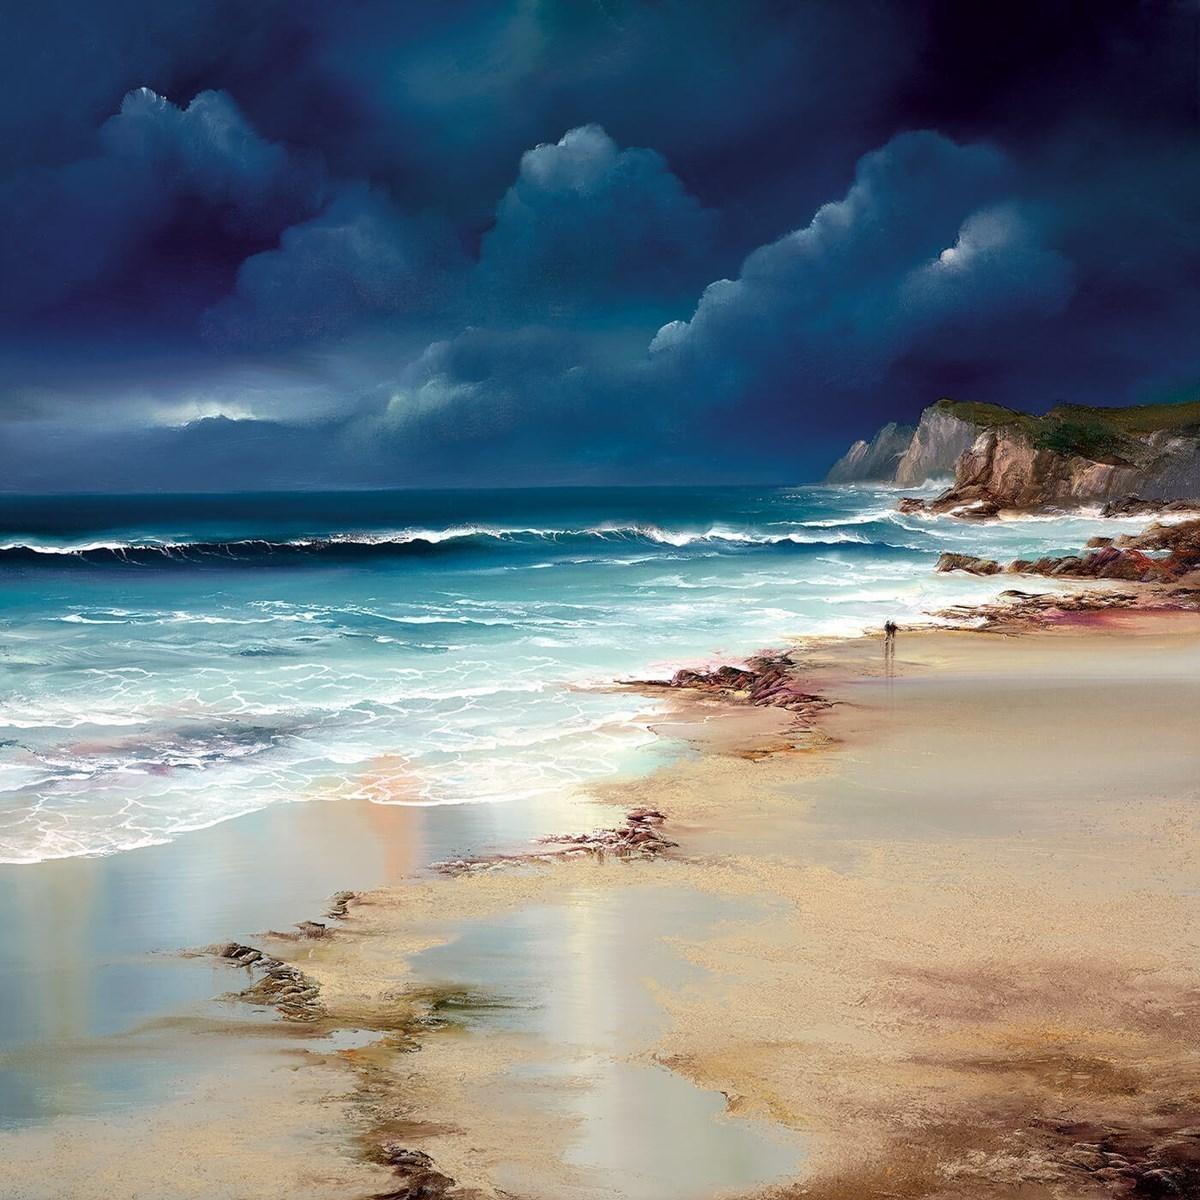 Philip Gray